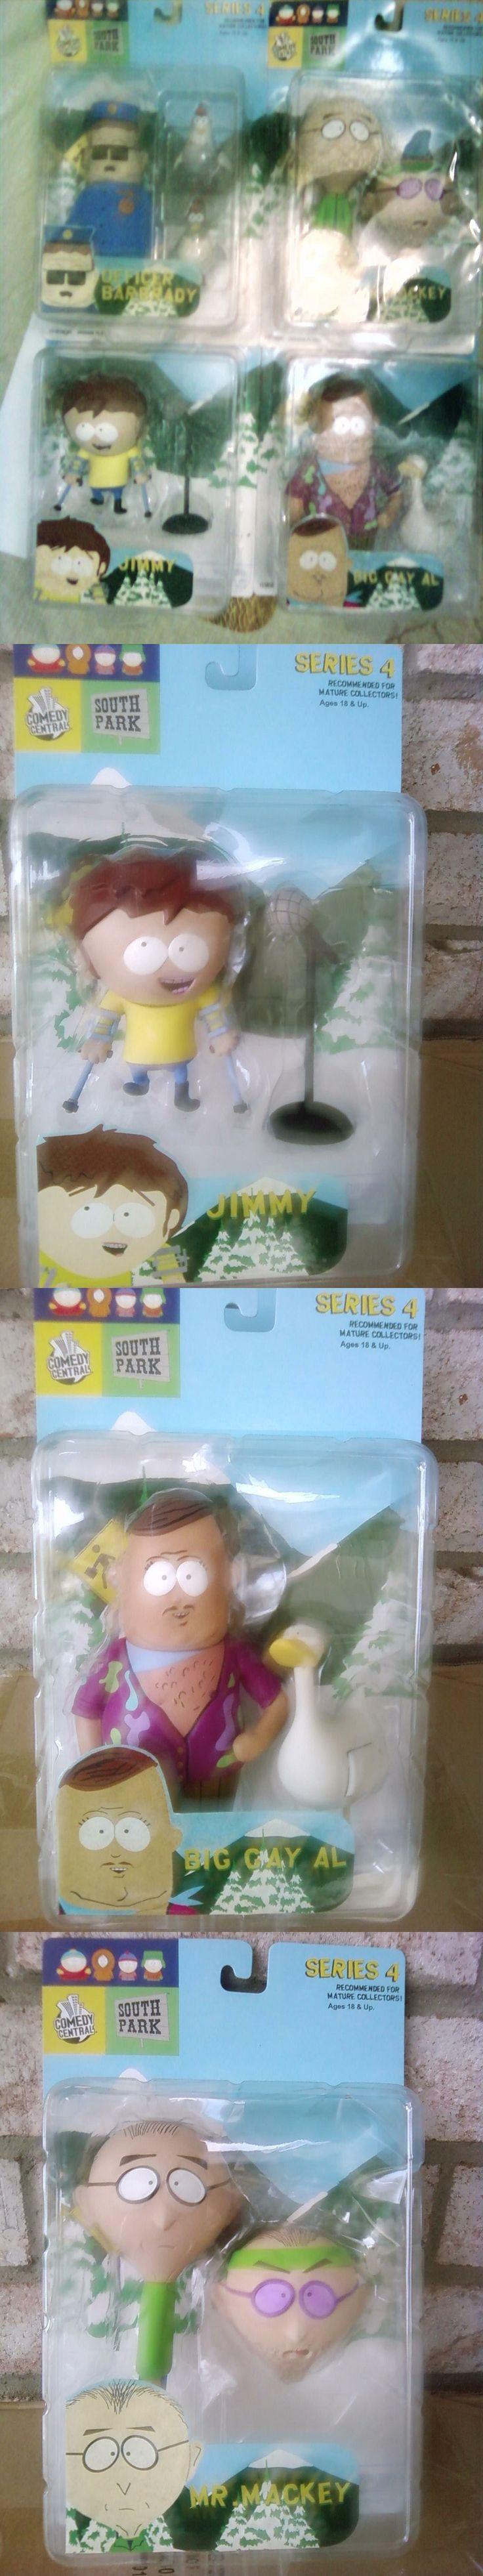 South Park 20918: South Park Series 4 Mr. Mackey,Big Gay Al, Officer Barbrady, Jimmy Set 4 Figure -> BUY IT NOW ONLY: $69.88 on eBay!